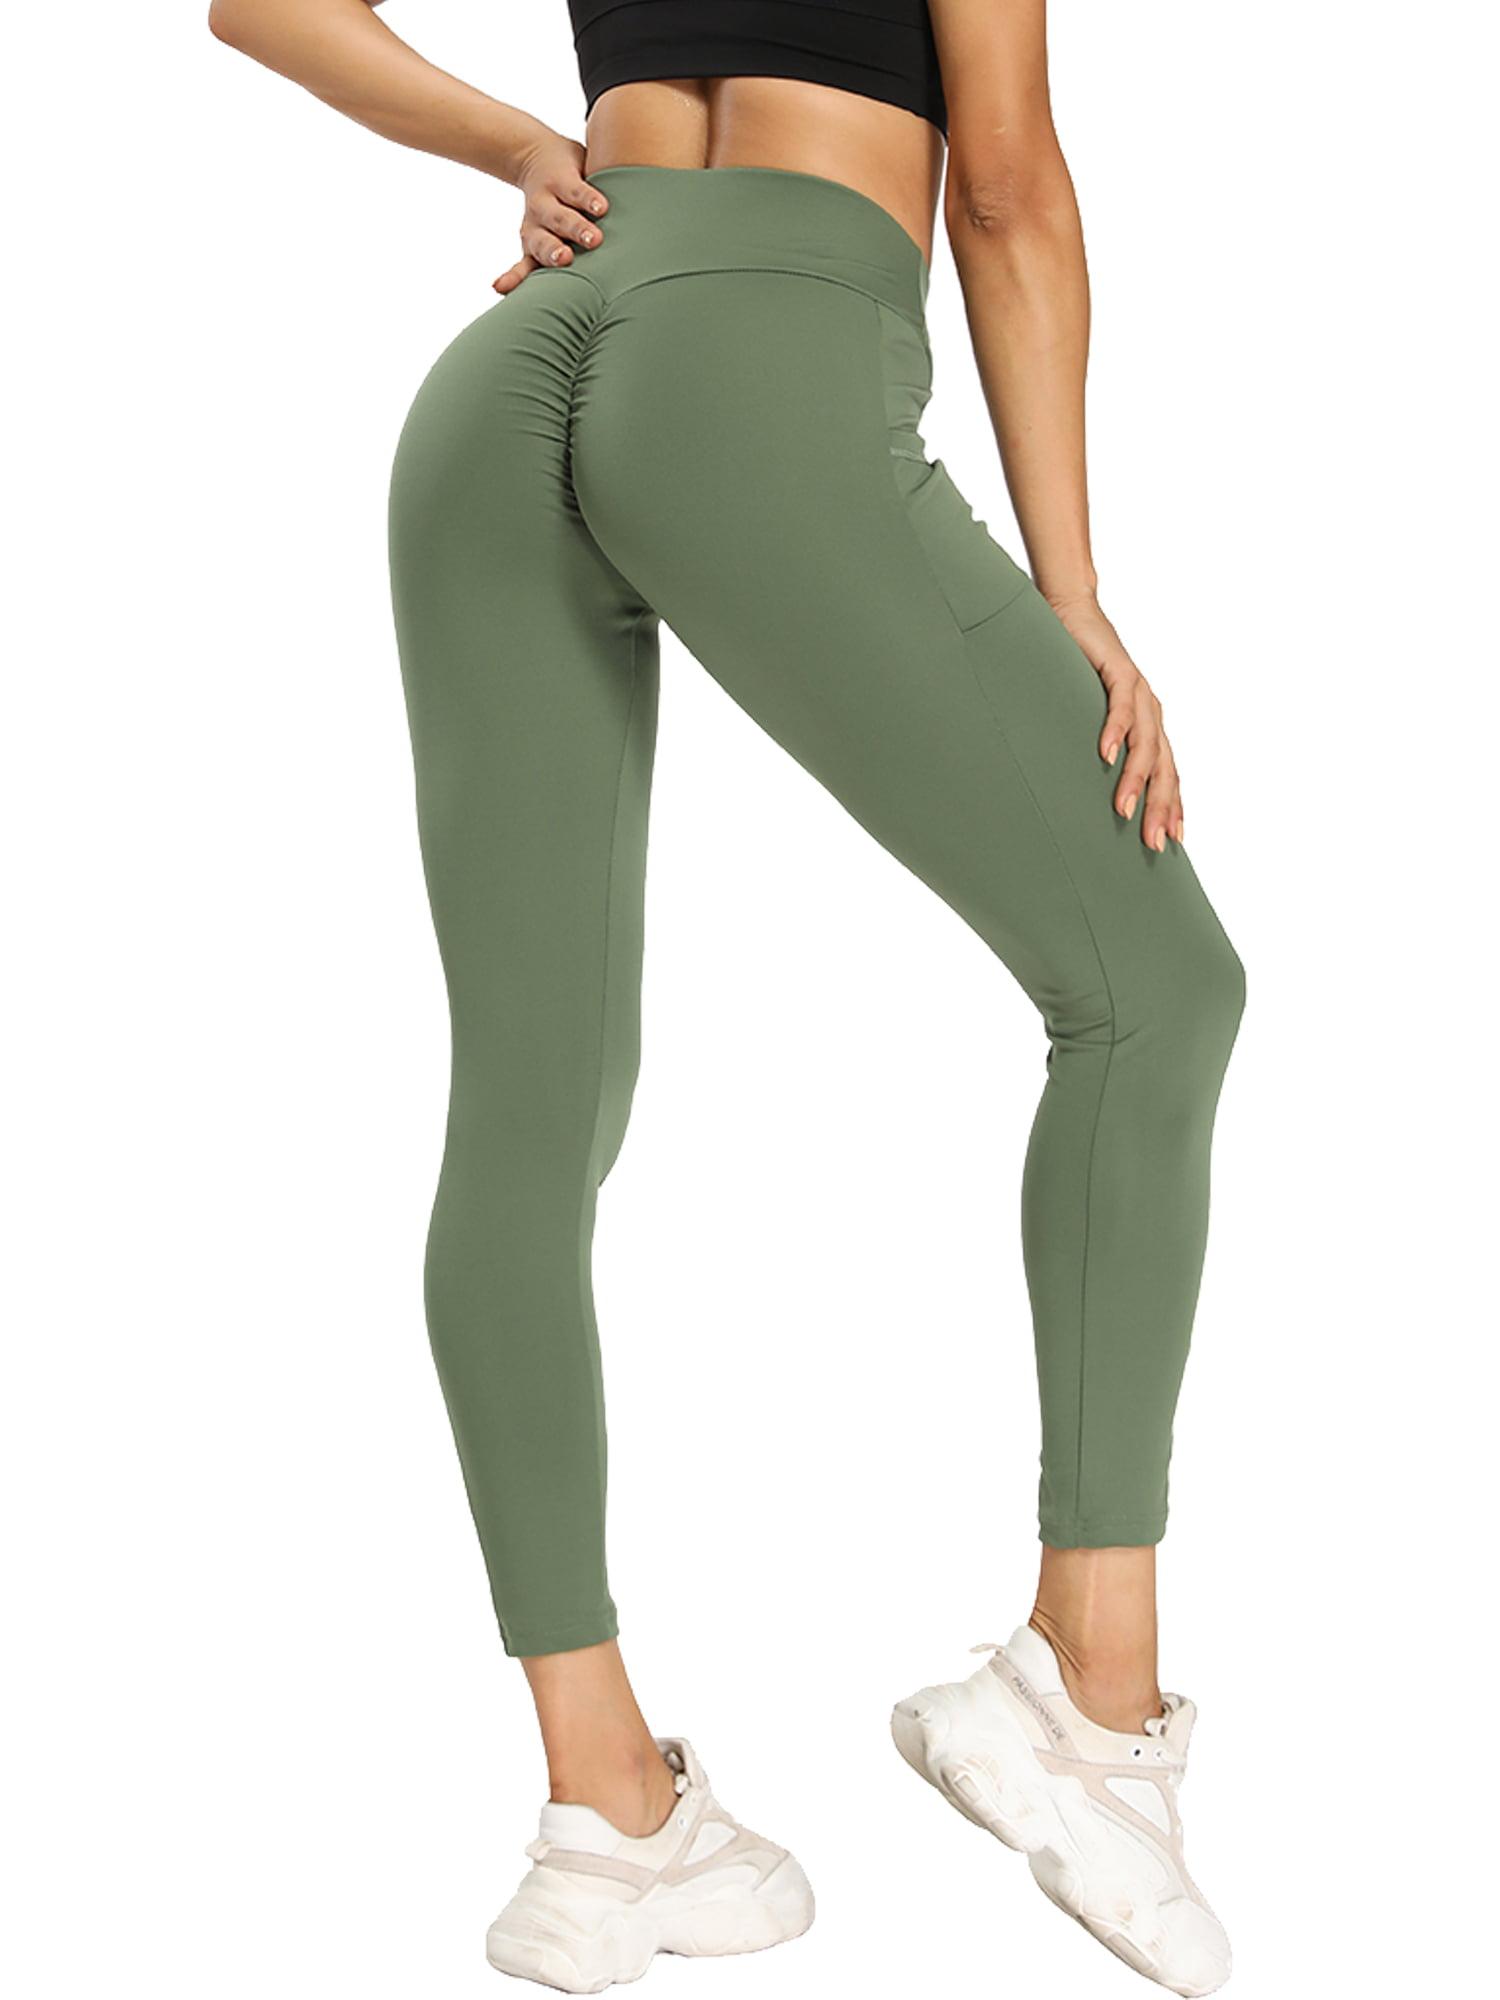 SLIMBELLE Scrunch Butt Lifting Leggings for Women High Waist Yoga Pants Gym Workout Tights TIK Tok Legging